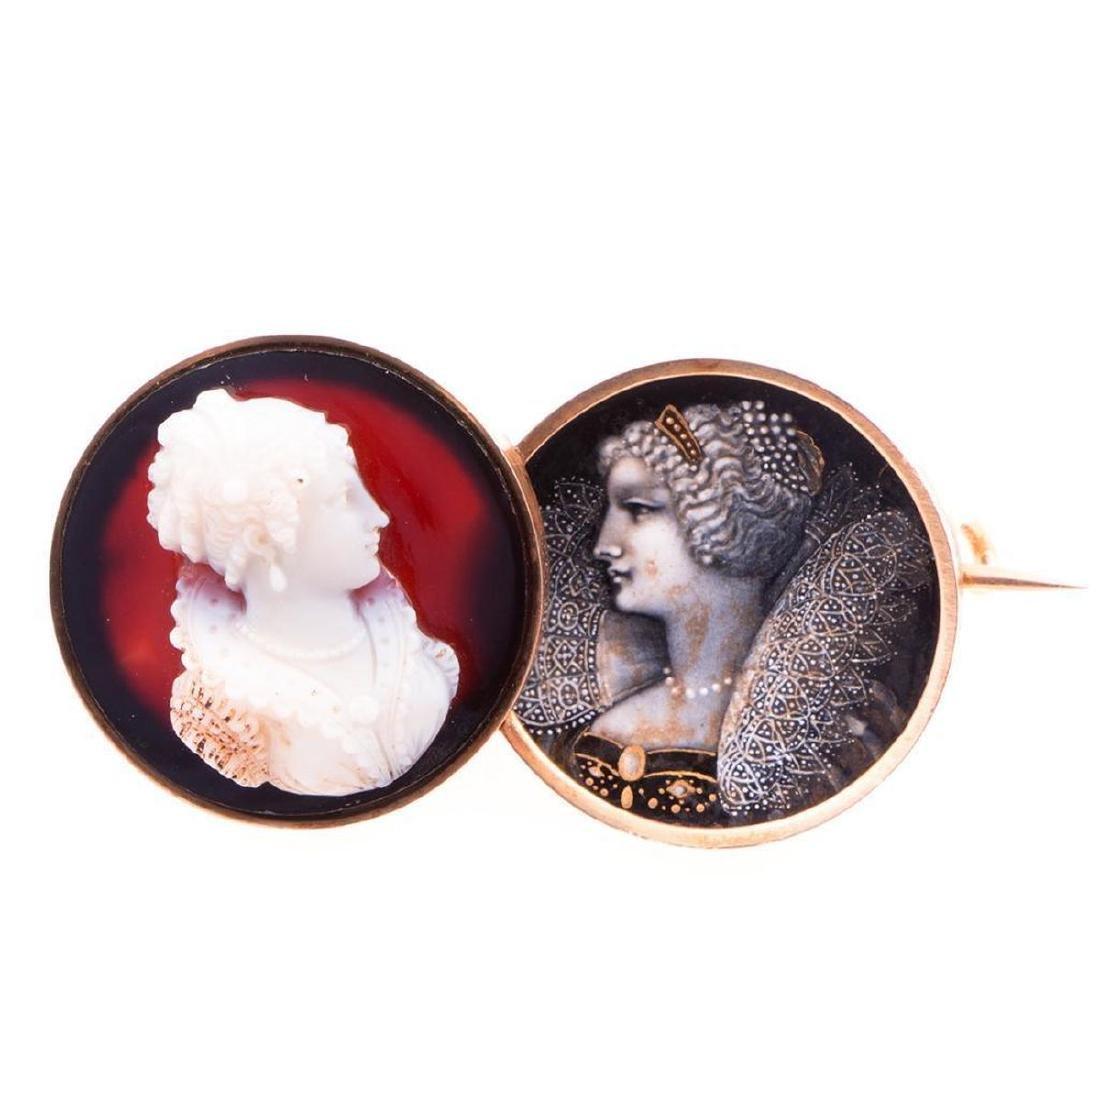 Antique enamel, hardstone cameo and 14k gold brooch